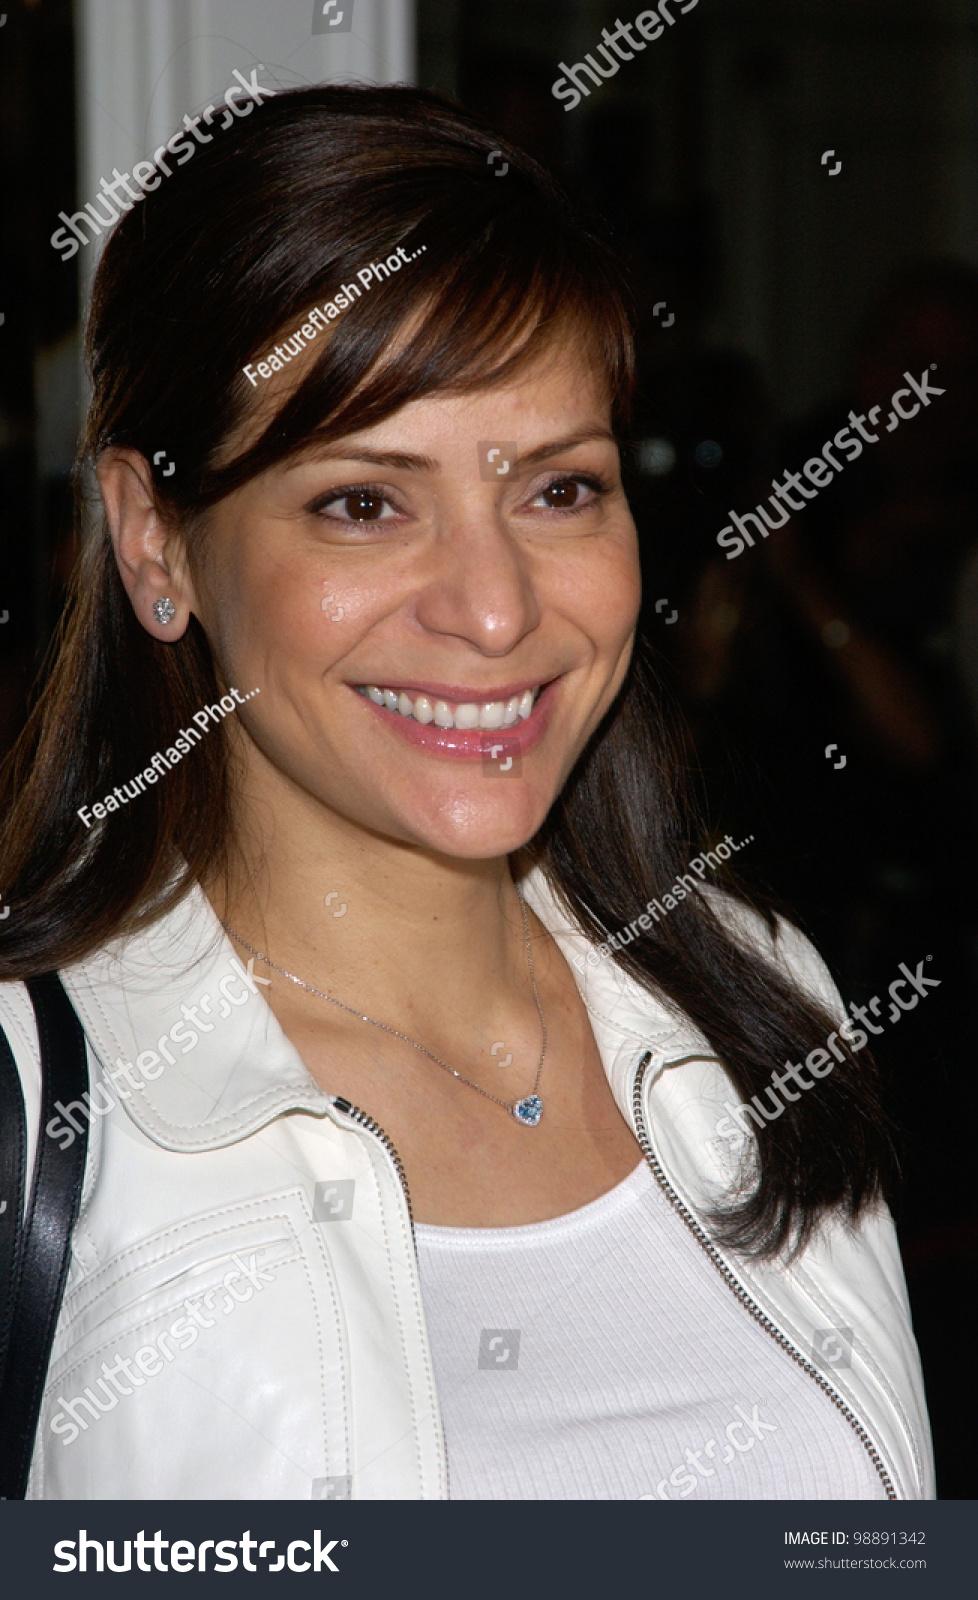 Beth Ostrosky Stern,Amelia Heinle XXX pics & movies Michael Learned,Nikki Sanderson